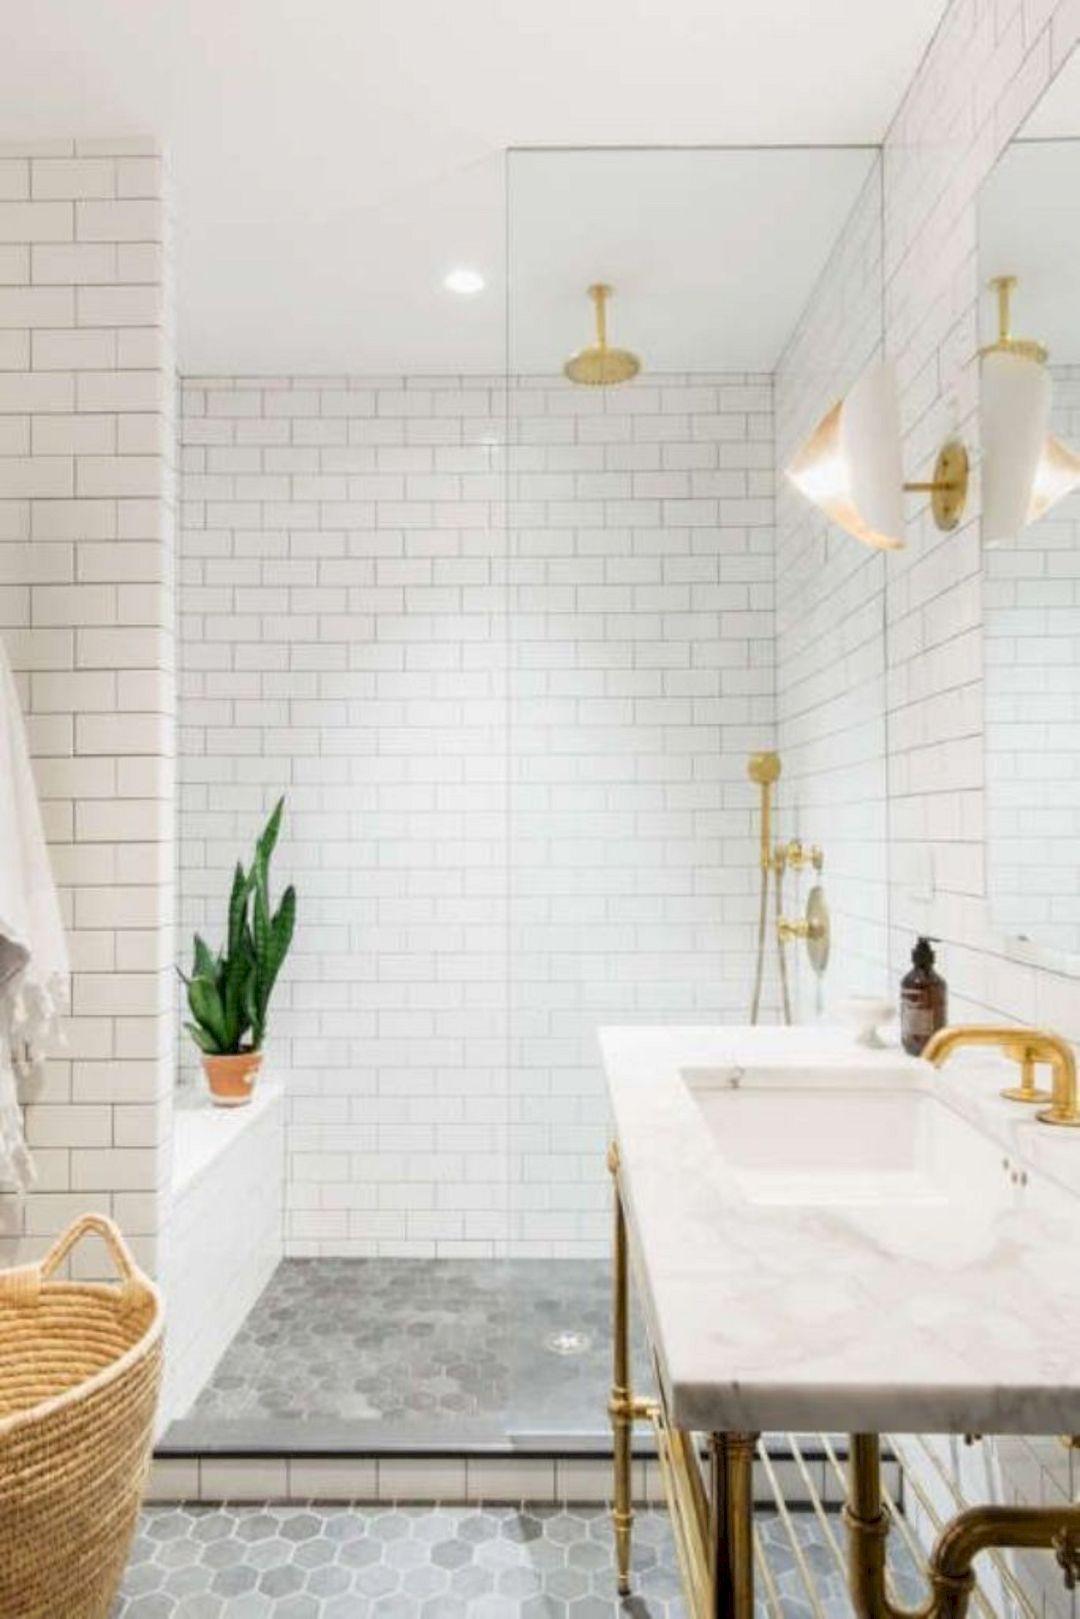 17 Small Townhouse Interior Design Ideas Small Bathroom Layout